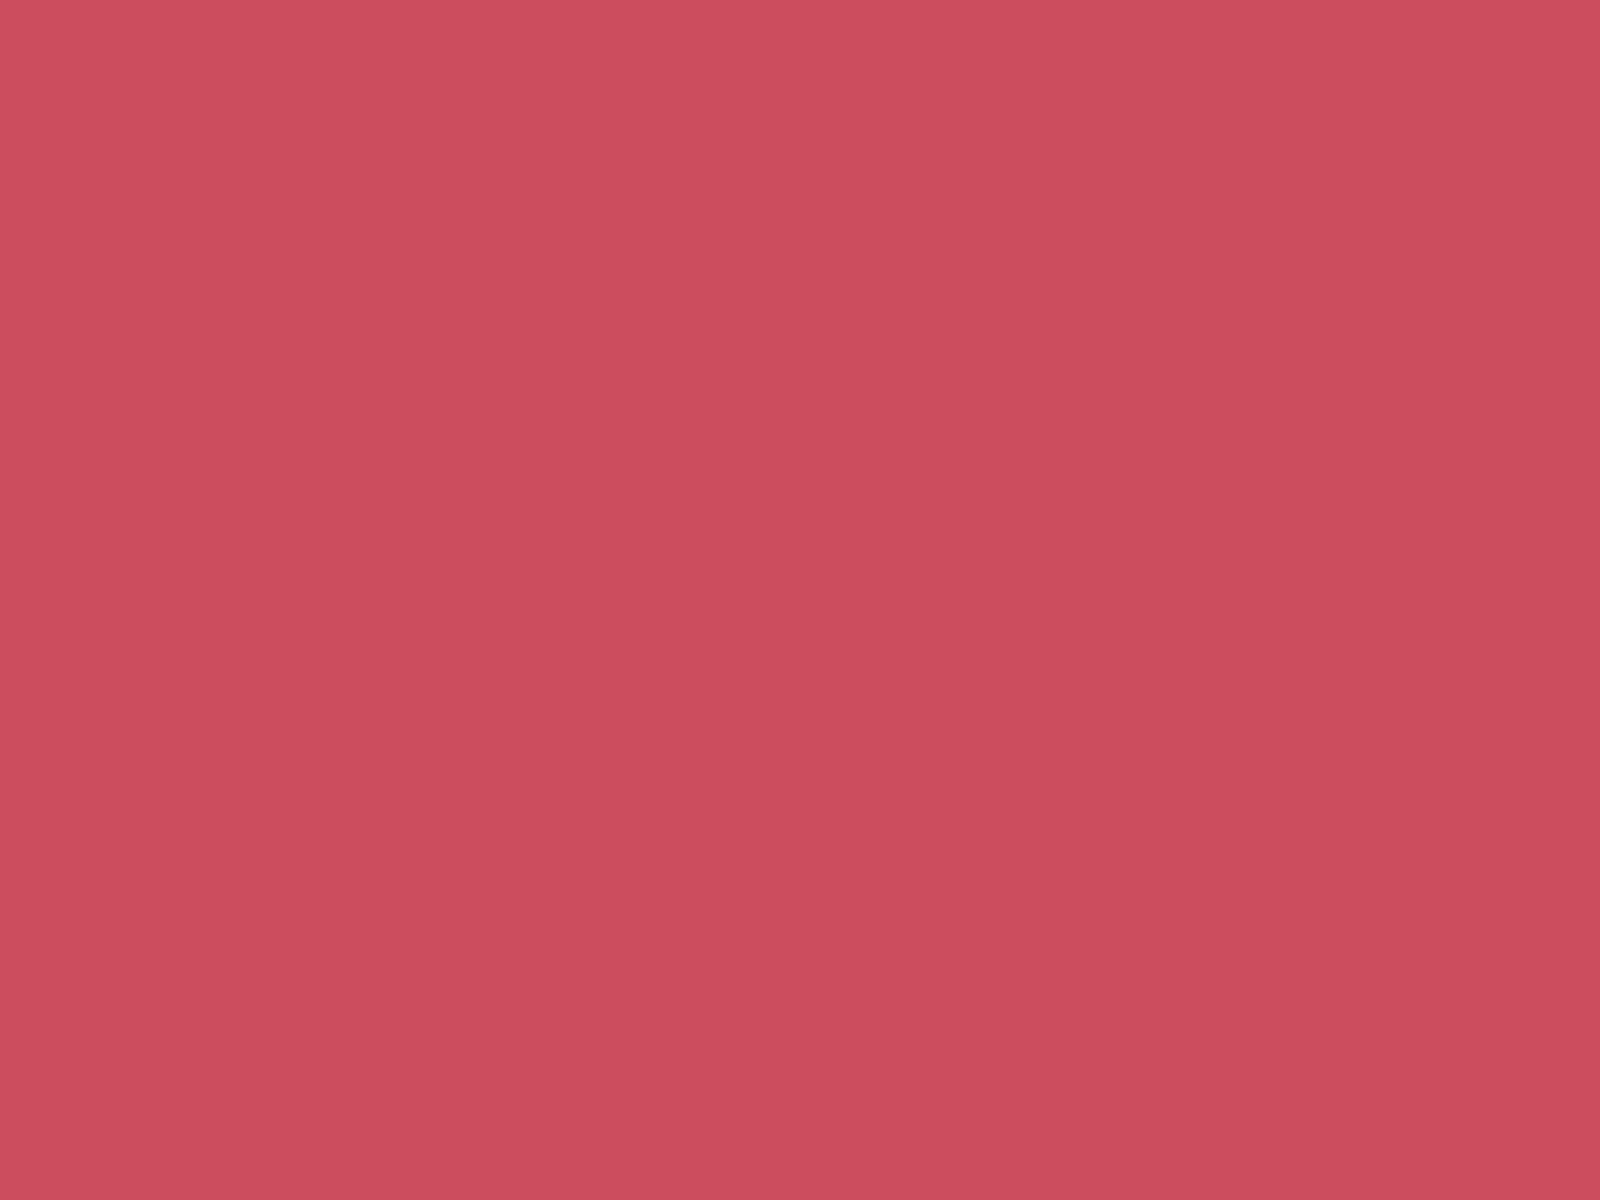 1600x1200 Dark Terra Cotta Solid Color Background